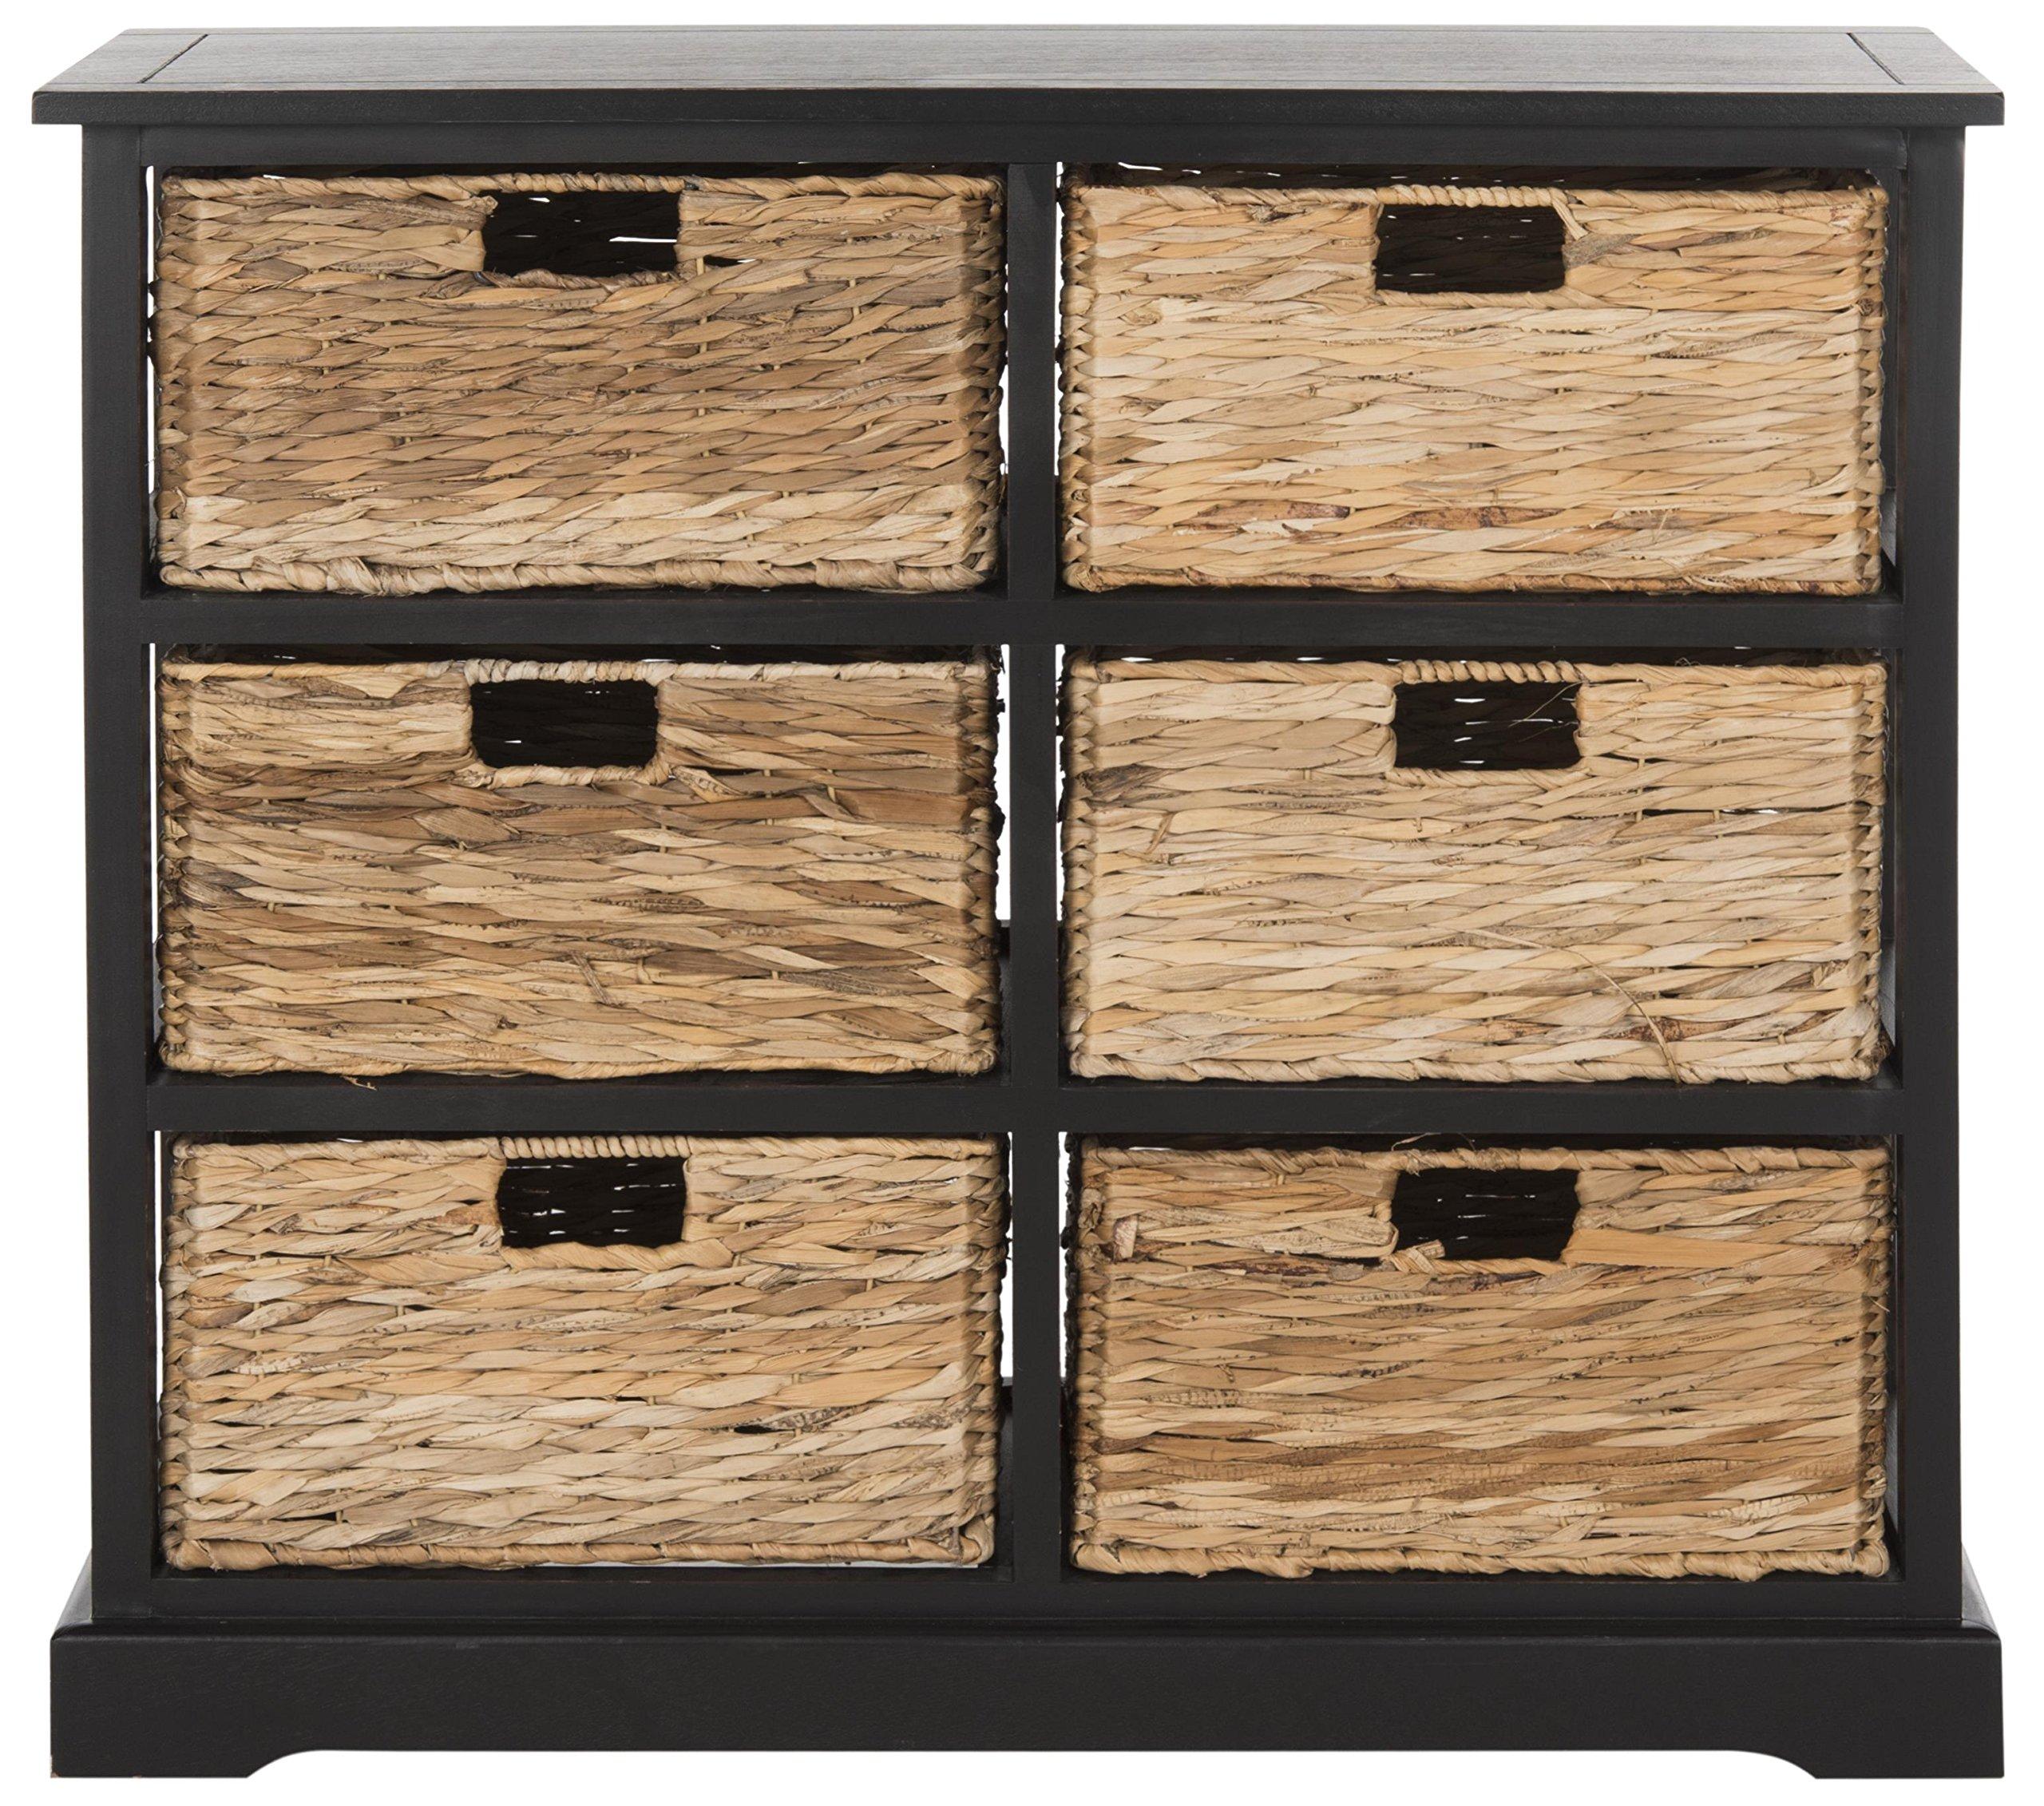 Safavieh American Homes Collection Keenan Distressed Black 6 Wicker Basket Storage Chest